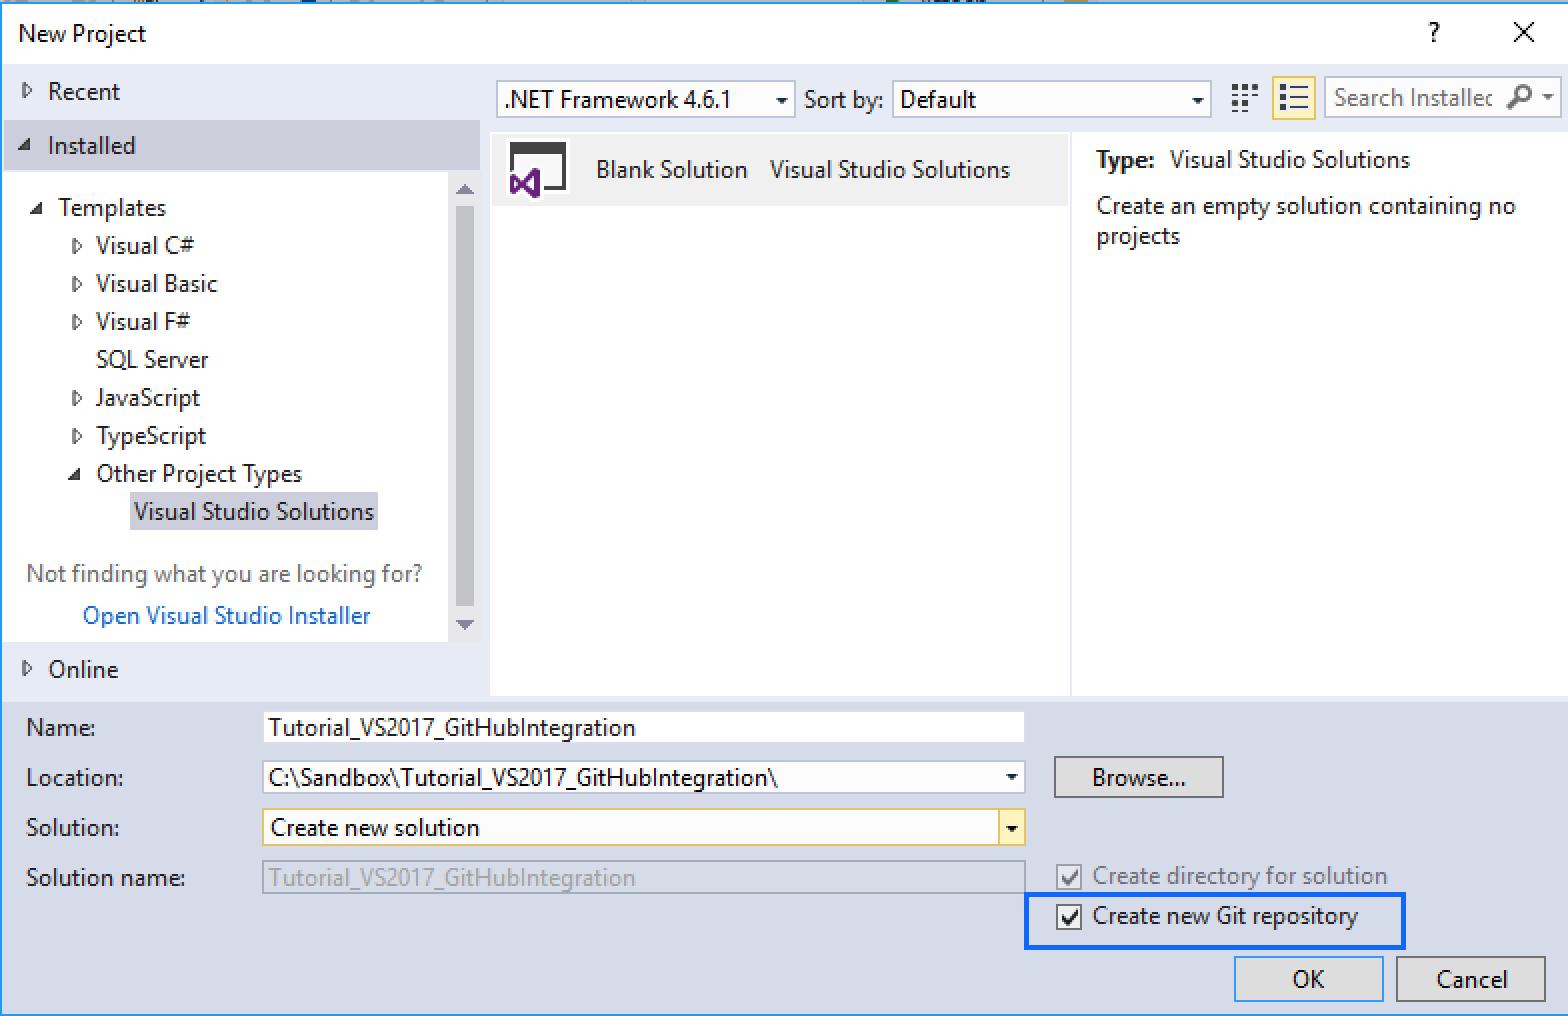 Integrating GitHub on Visual Studio 2017 : Your First Repo